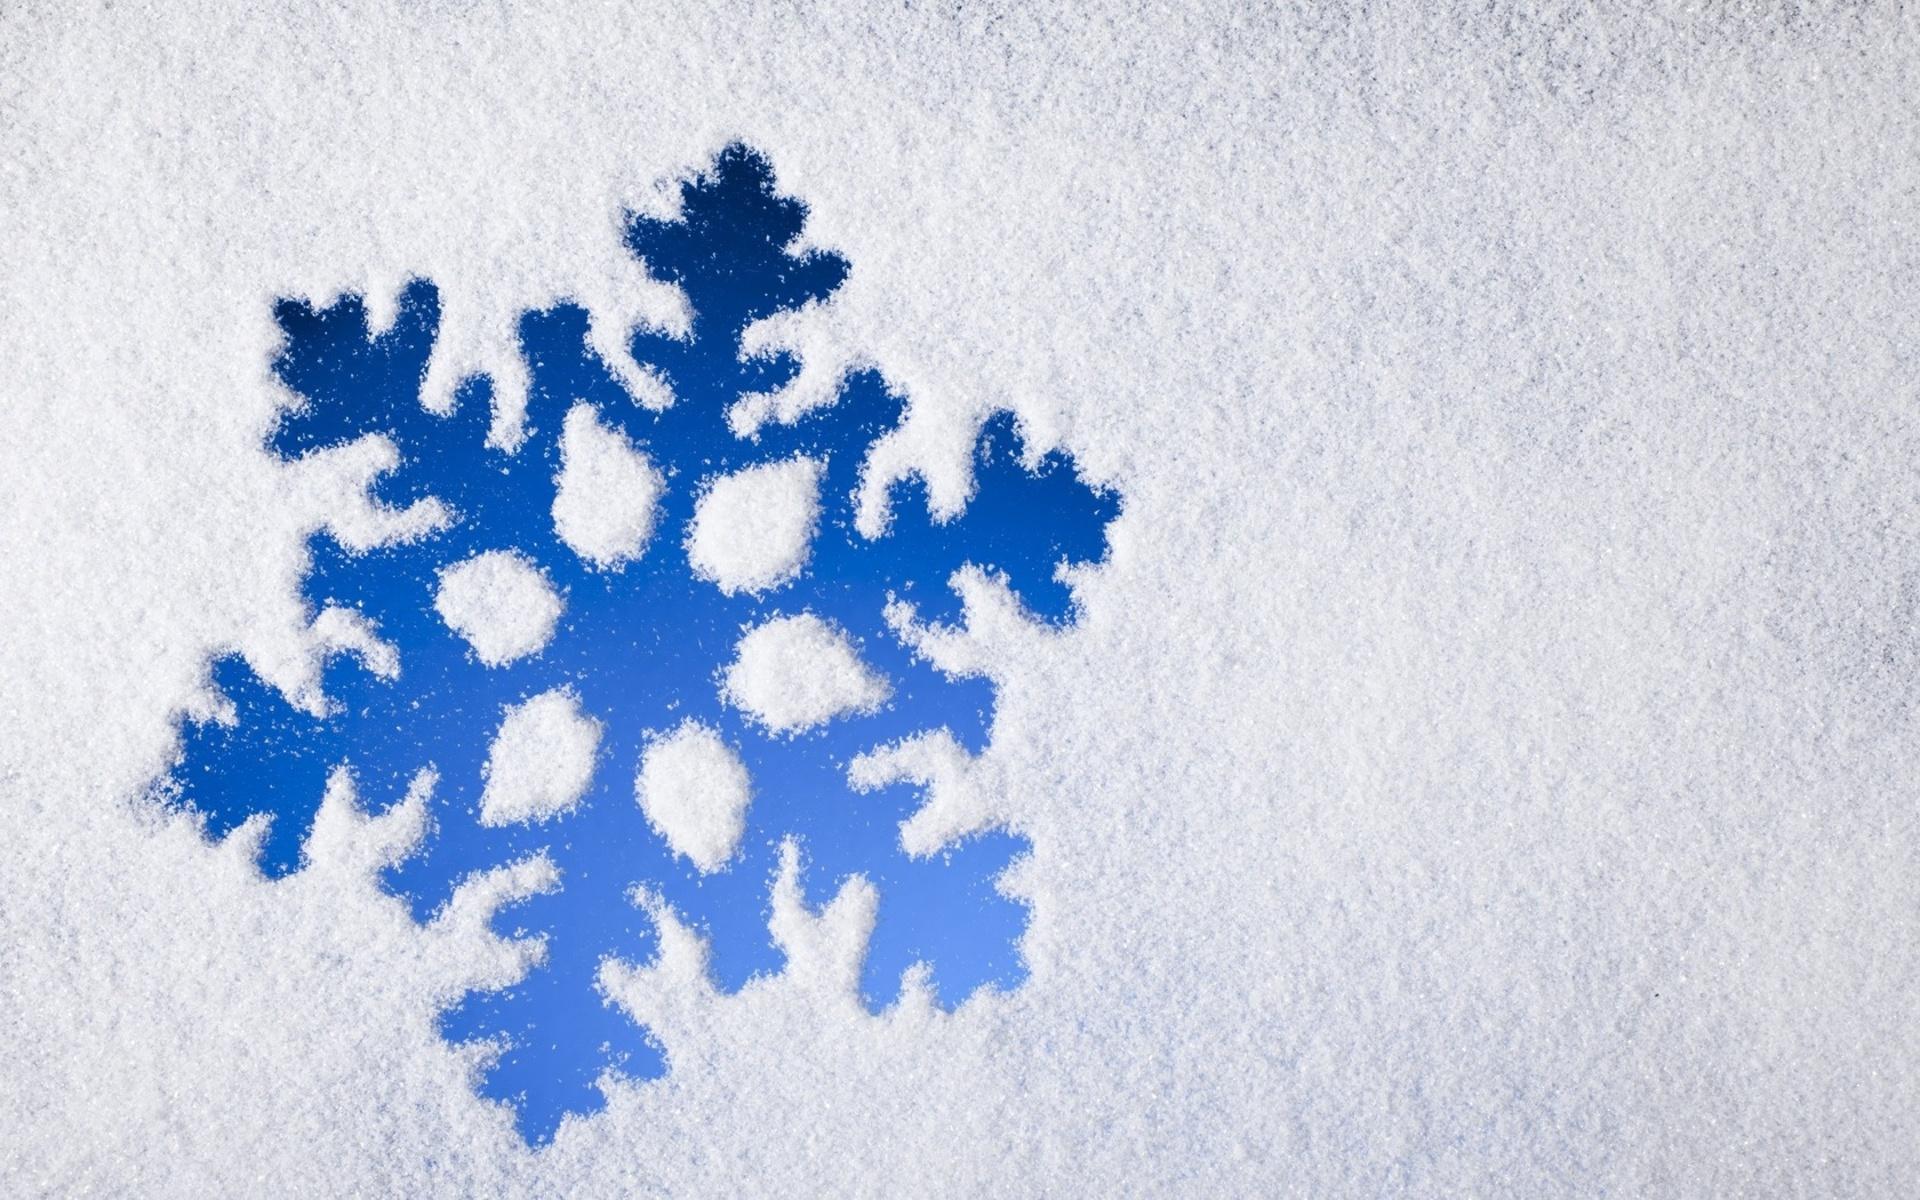 открытка зима снежинка разделе джокер